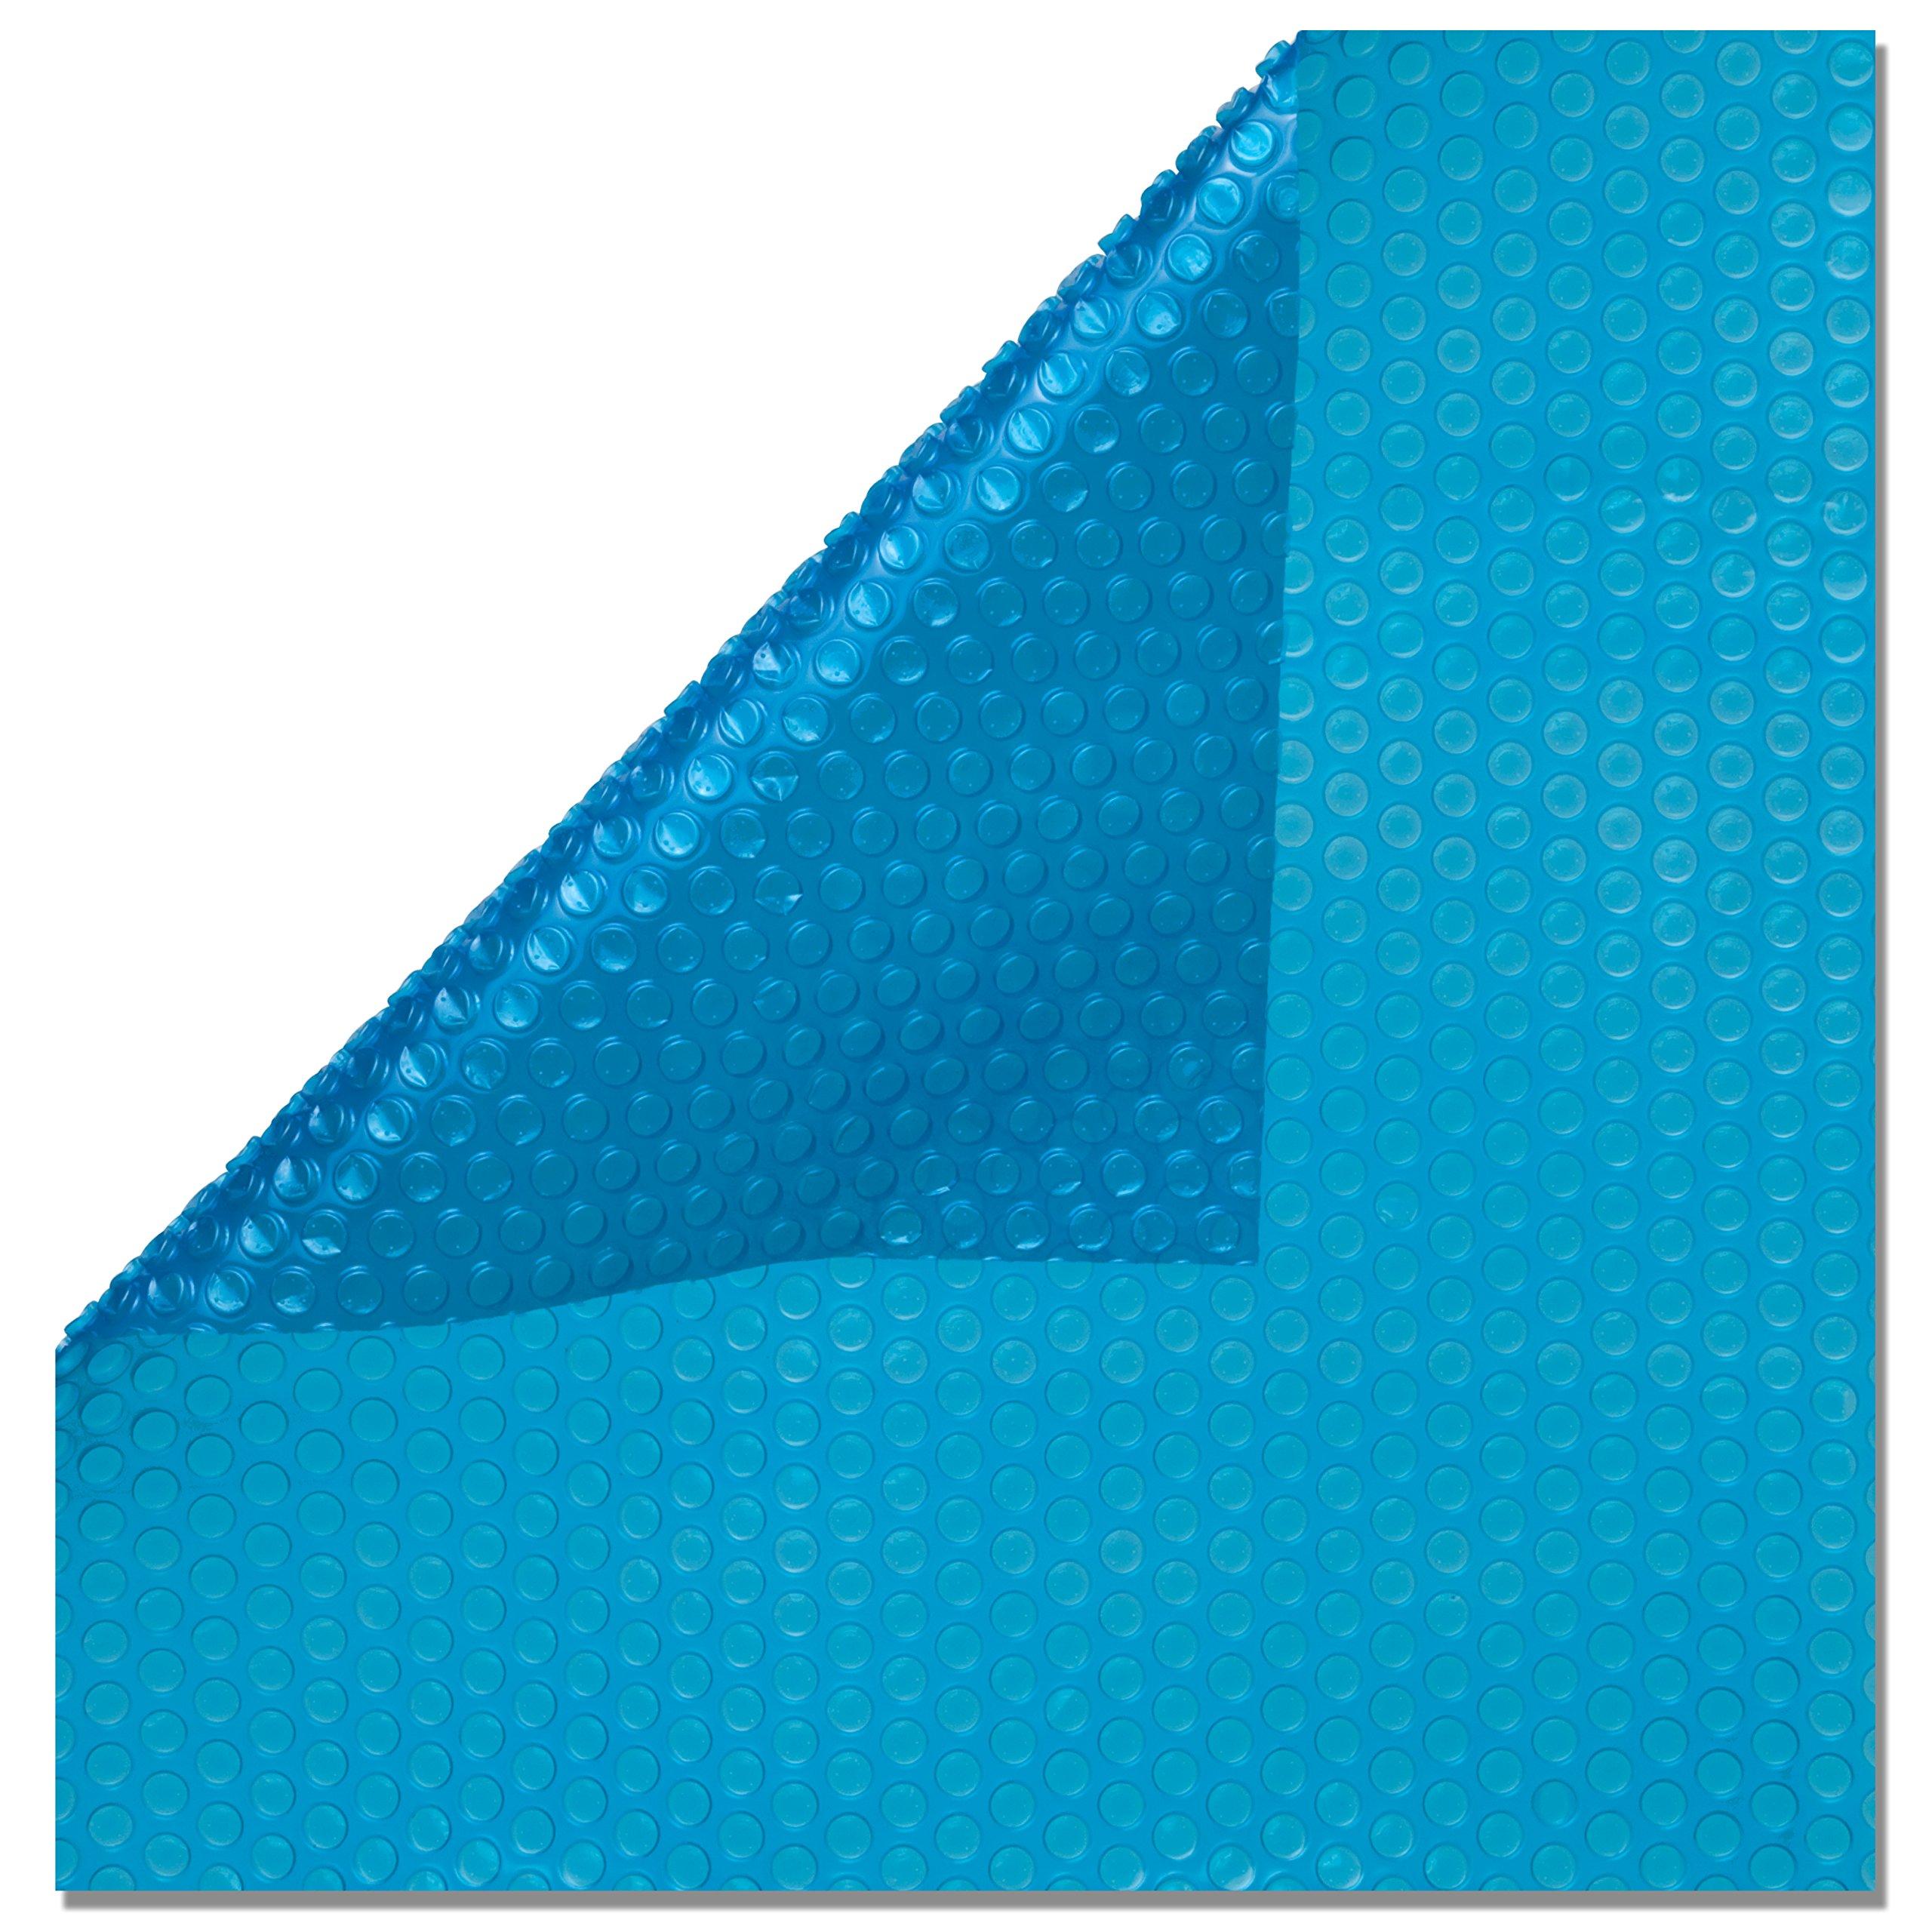 In The Swim 16' x 32' ft. Rectangle Swimming Pool Solar Blanket Cover, 12 Mil